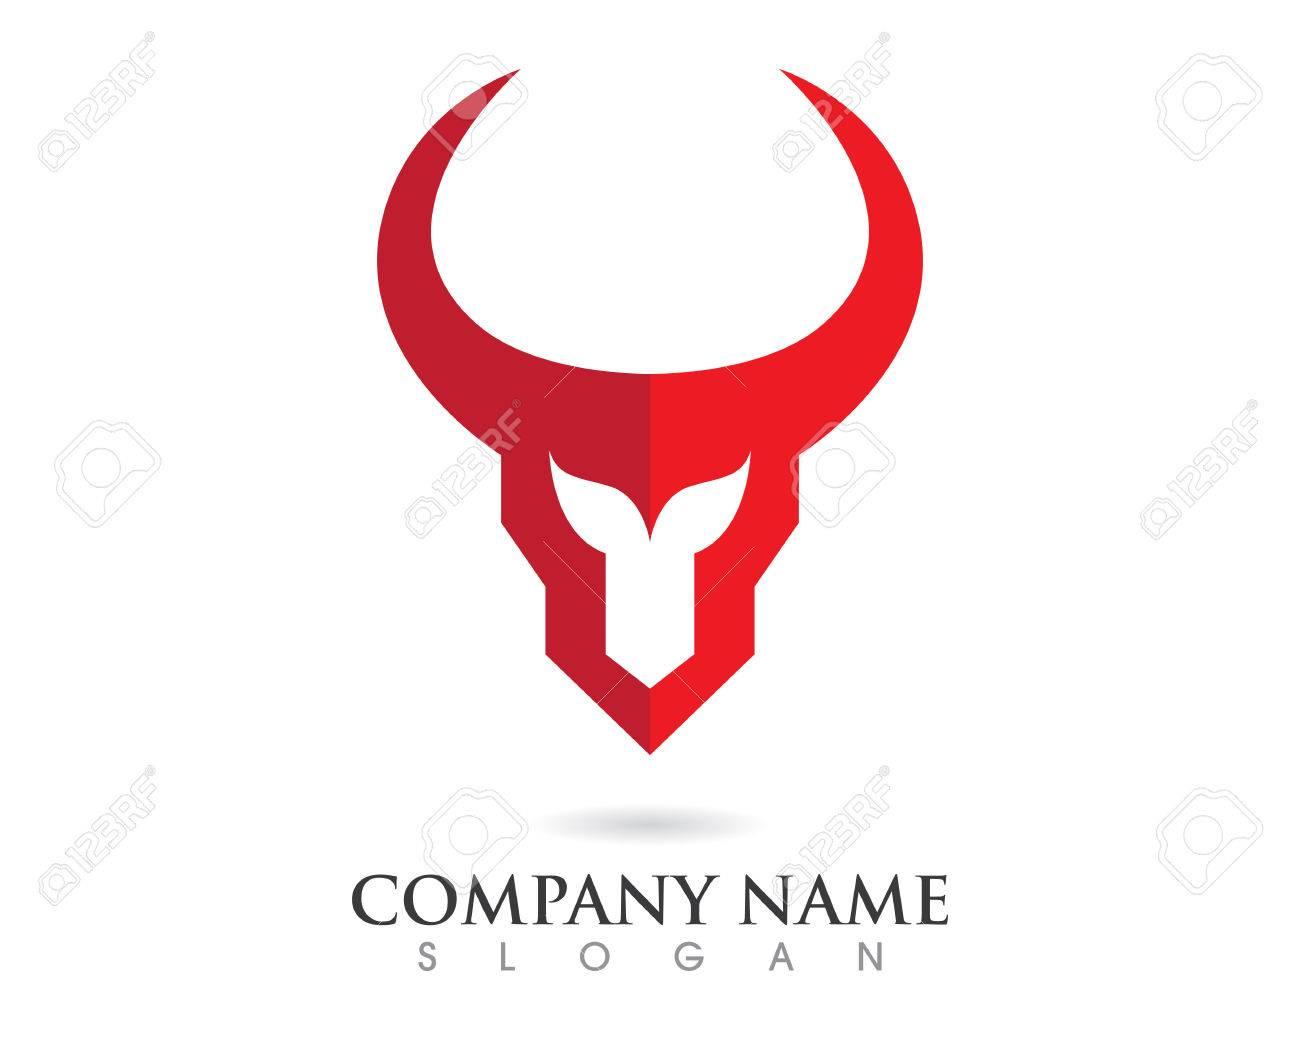 red bull taurus logo template vector icon illustration royalty free rh 123rf com taurus logo pistol grips 1911 taurus logo pistol grips